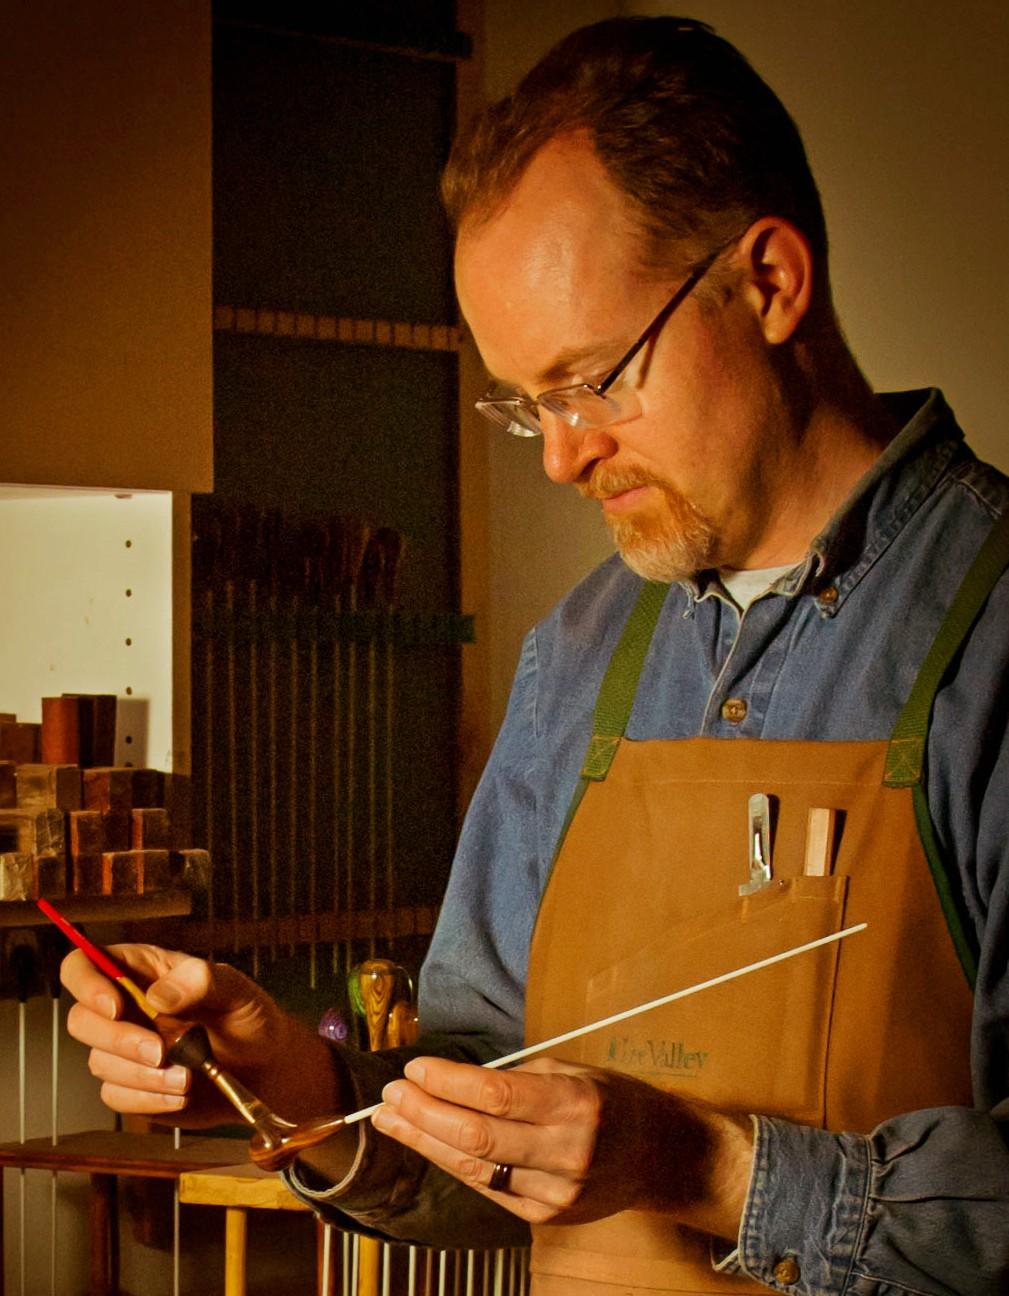 Chris Blount - Owner / Craftsman